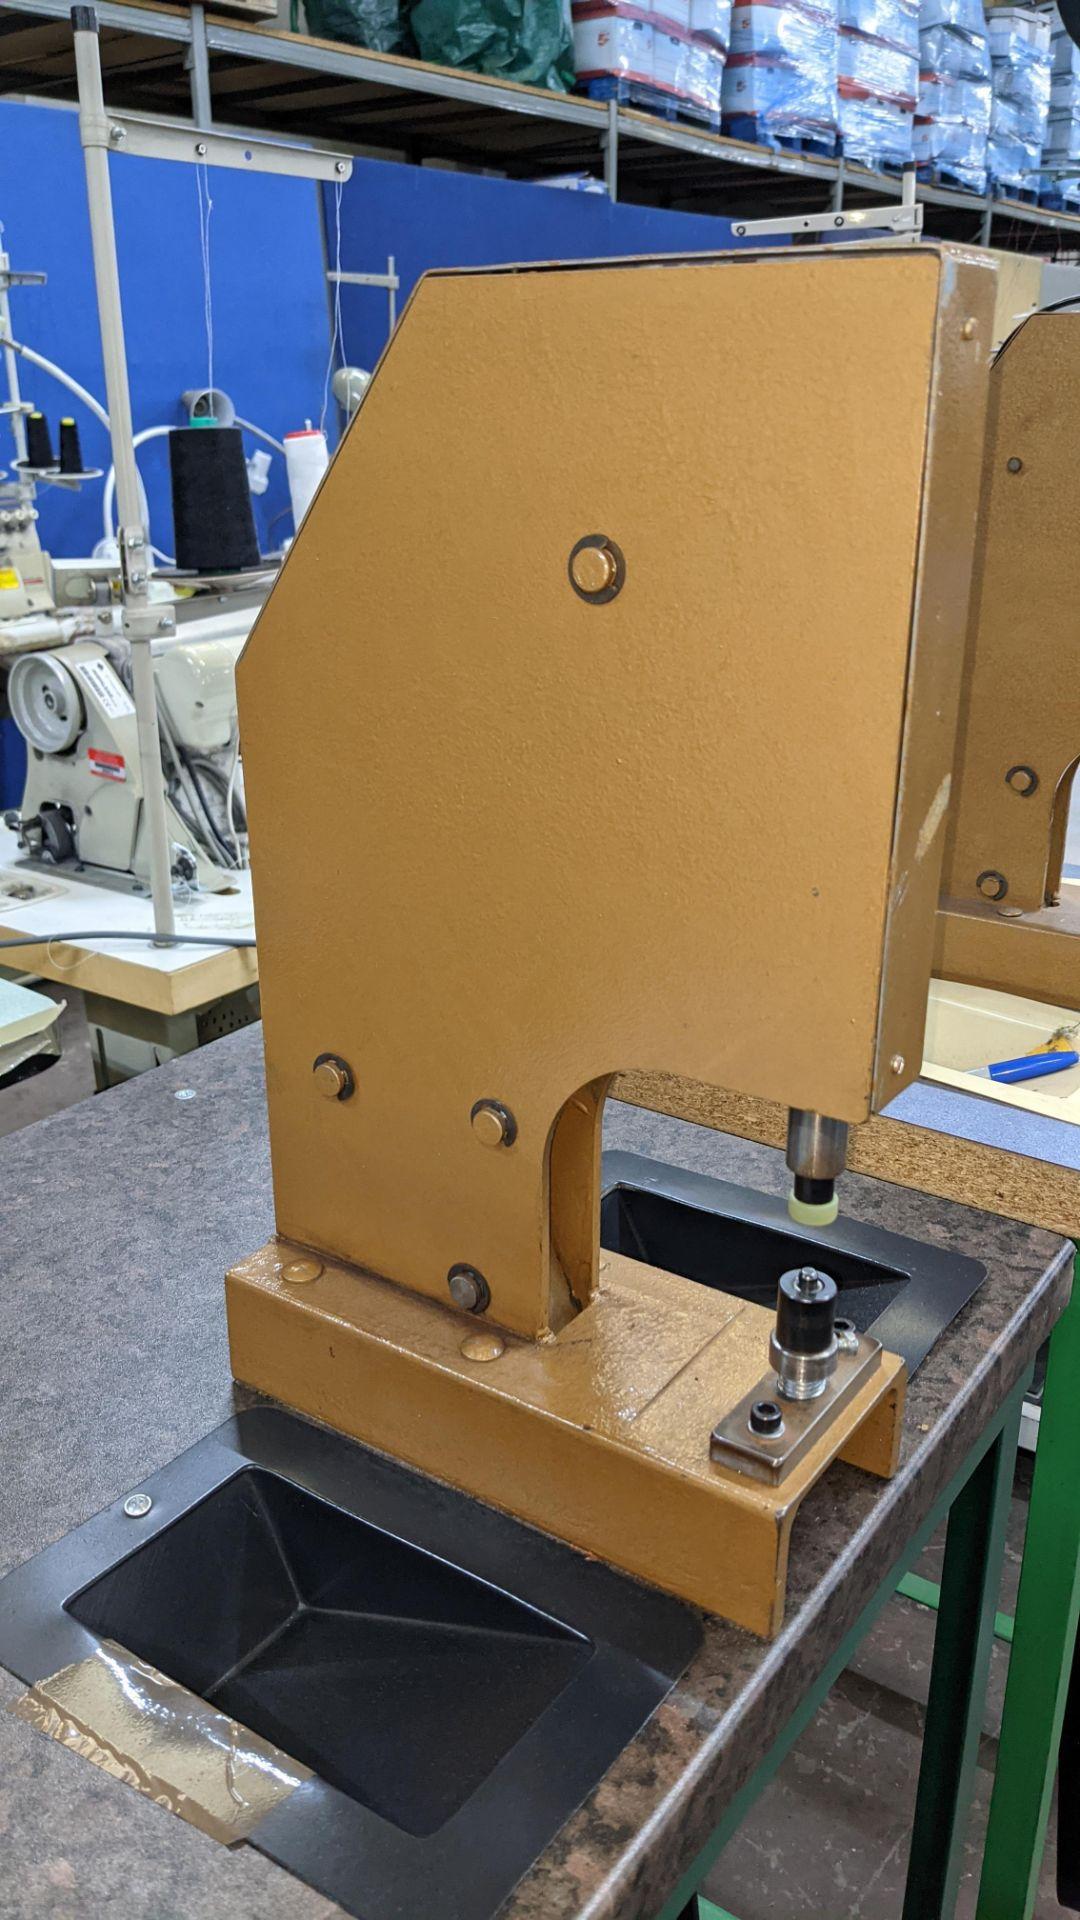 Foot operated riveting machine/press stud machine - Image 7 of 9